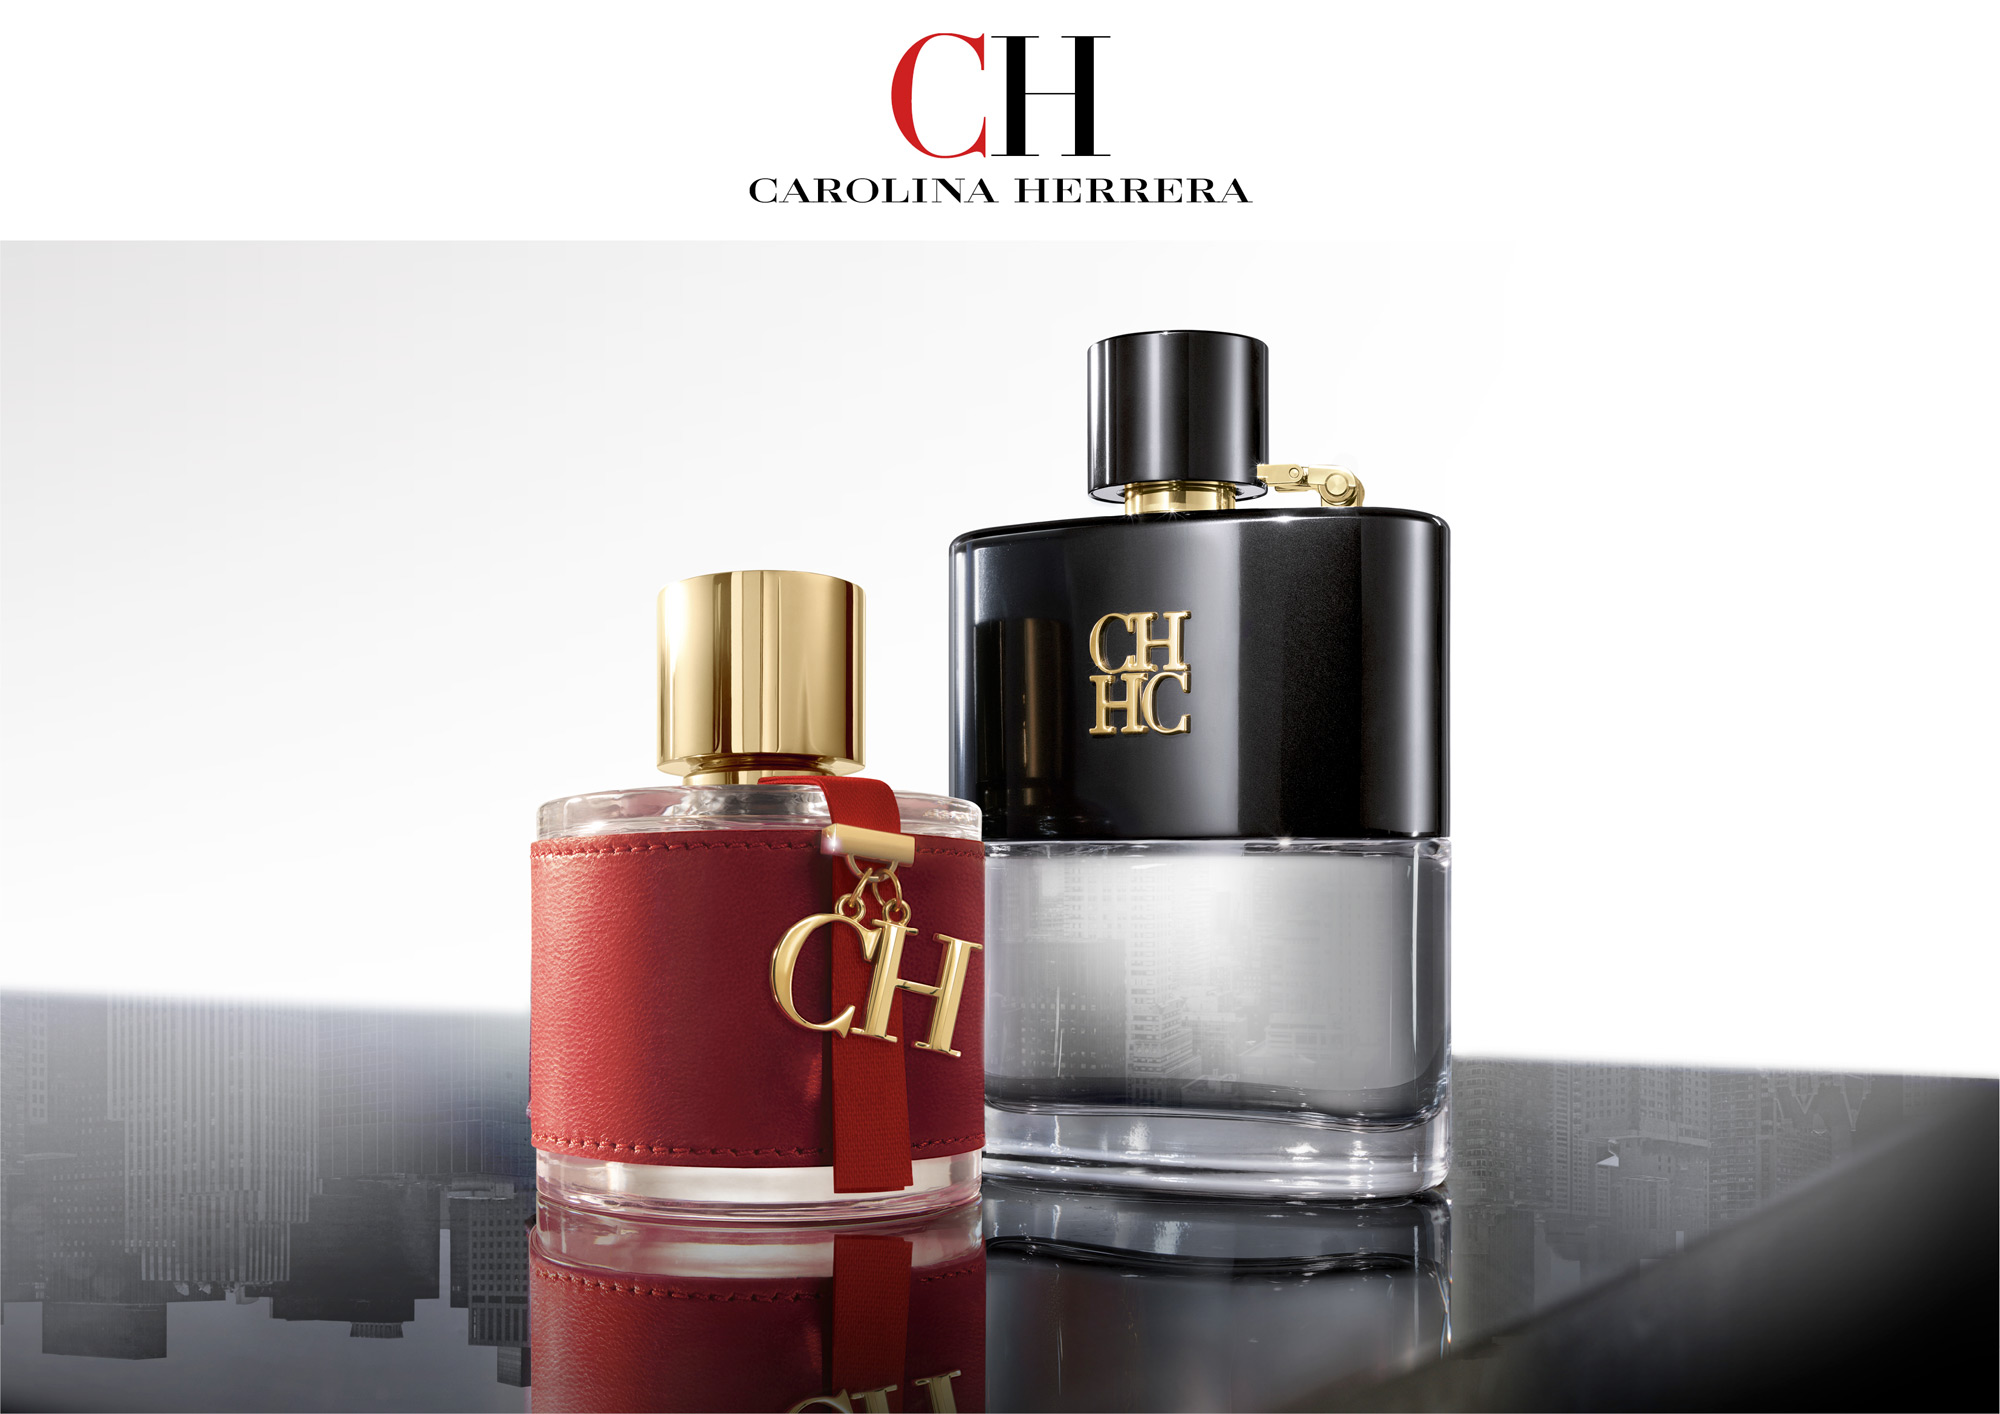 2e60457d5cdd0 CH (2015) Carolina Herrera perfumy - to perfumy dla kobiet 2015